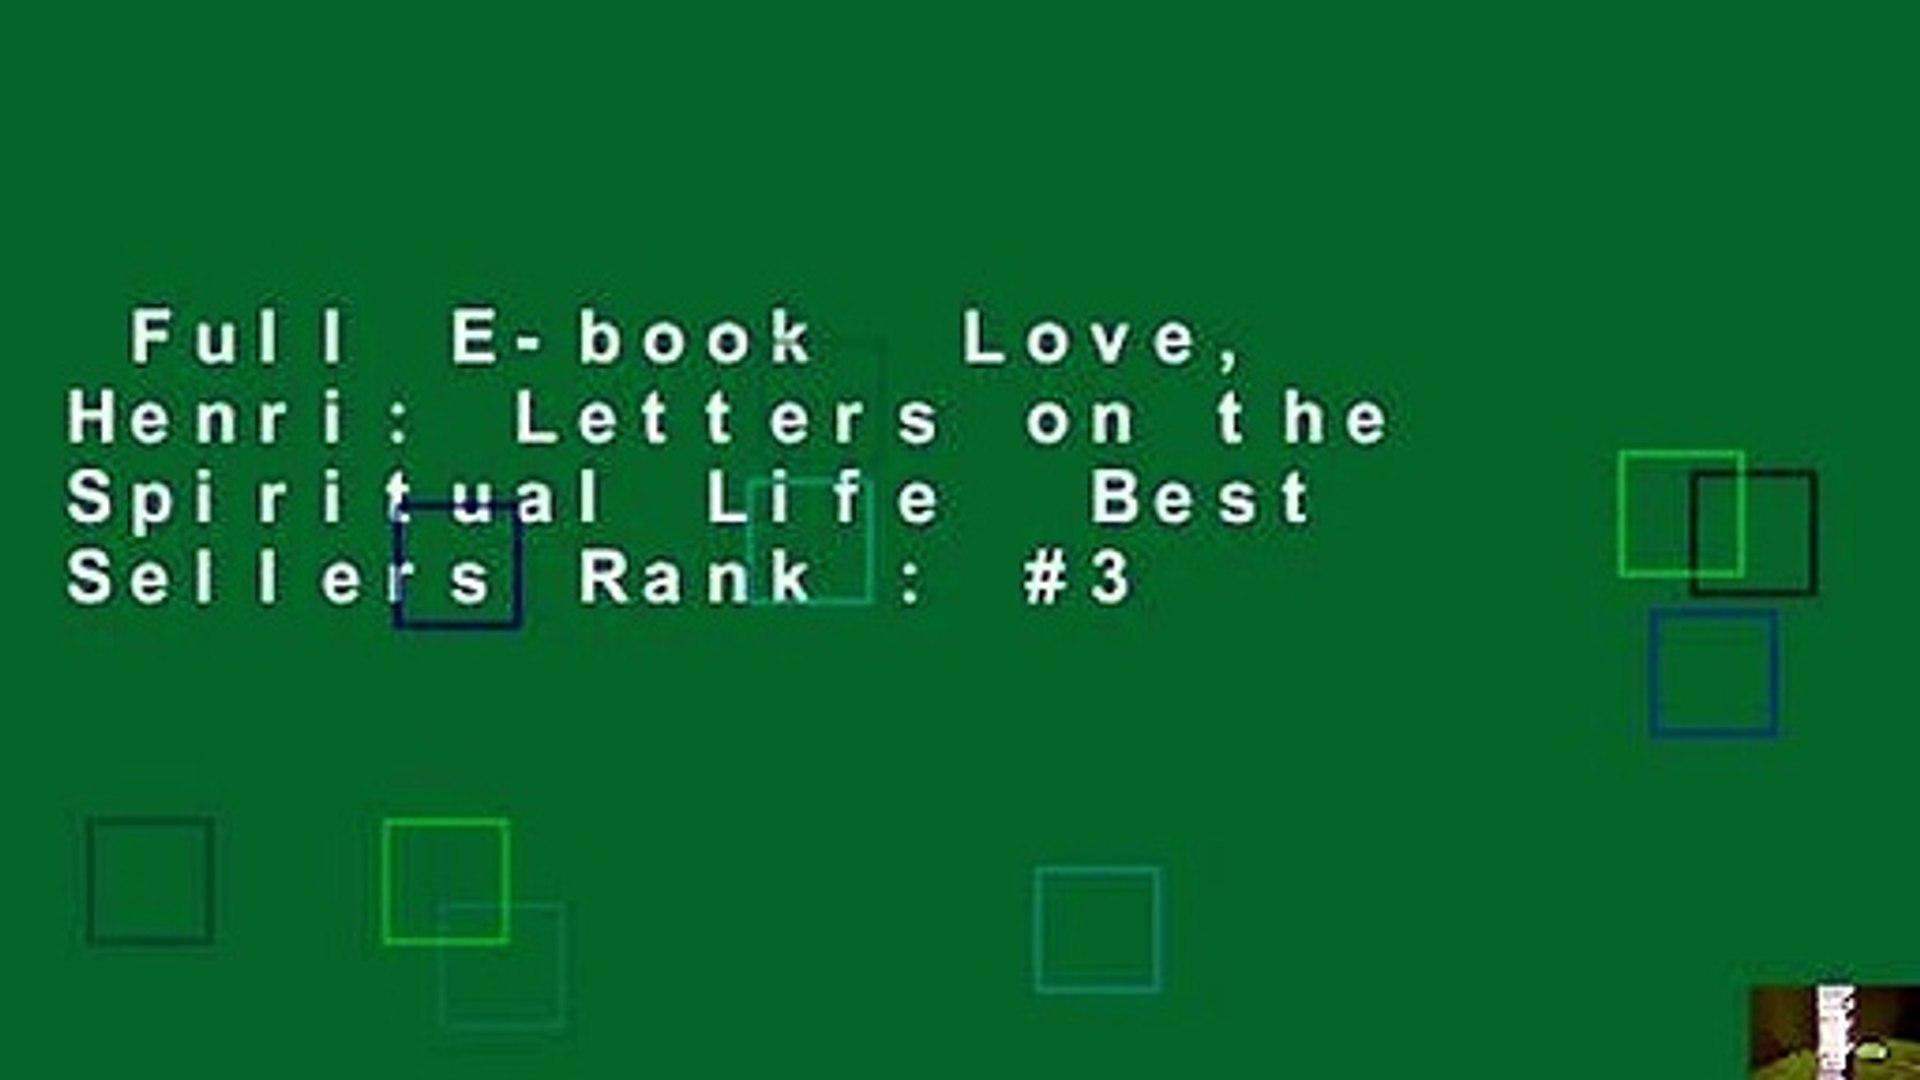 Full E-book  Love, Henri: Letters on the Spiritual Life  Best Sellers Rank : #3